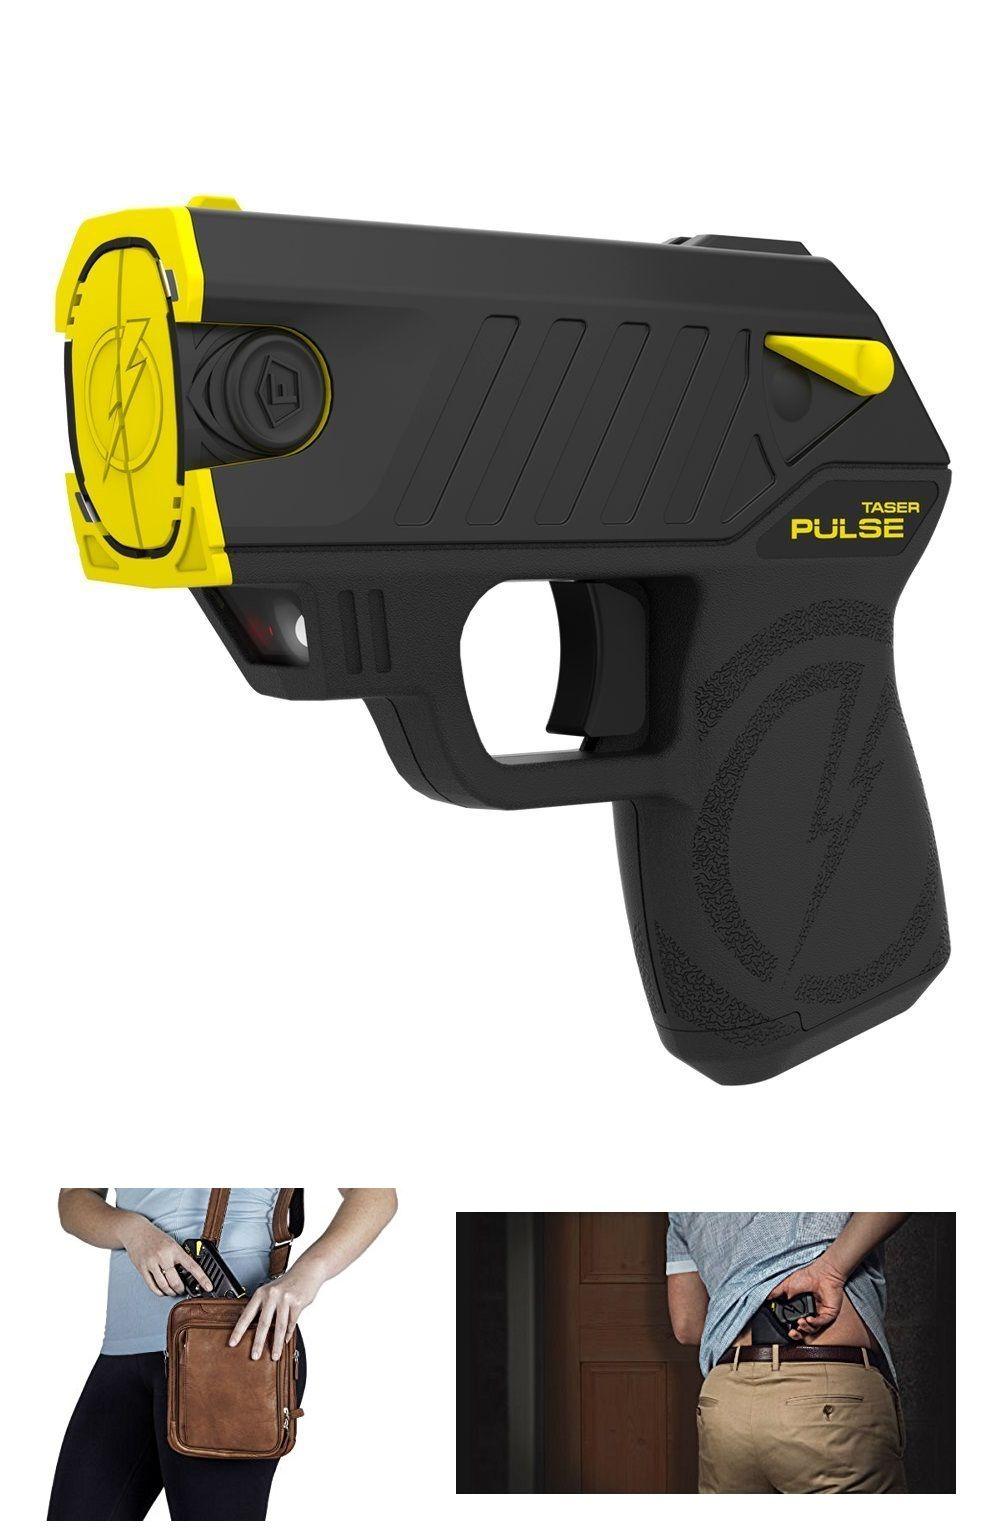 TASER Pulse Stun Gun | Craze Trend